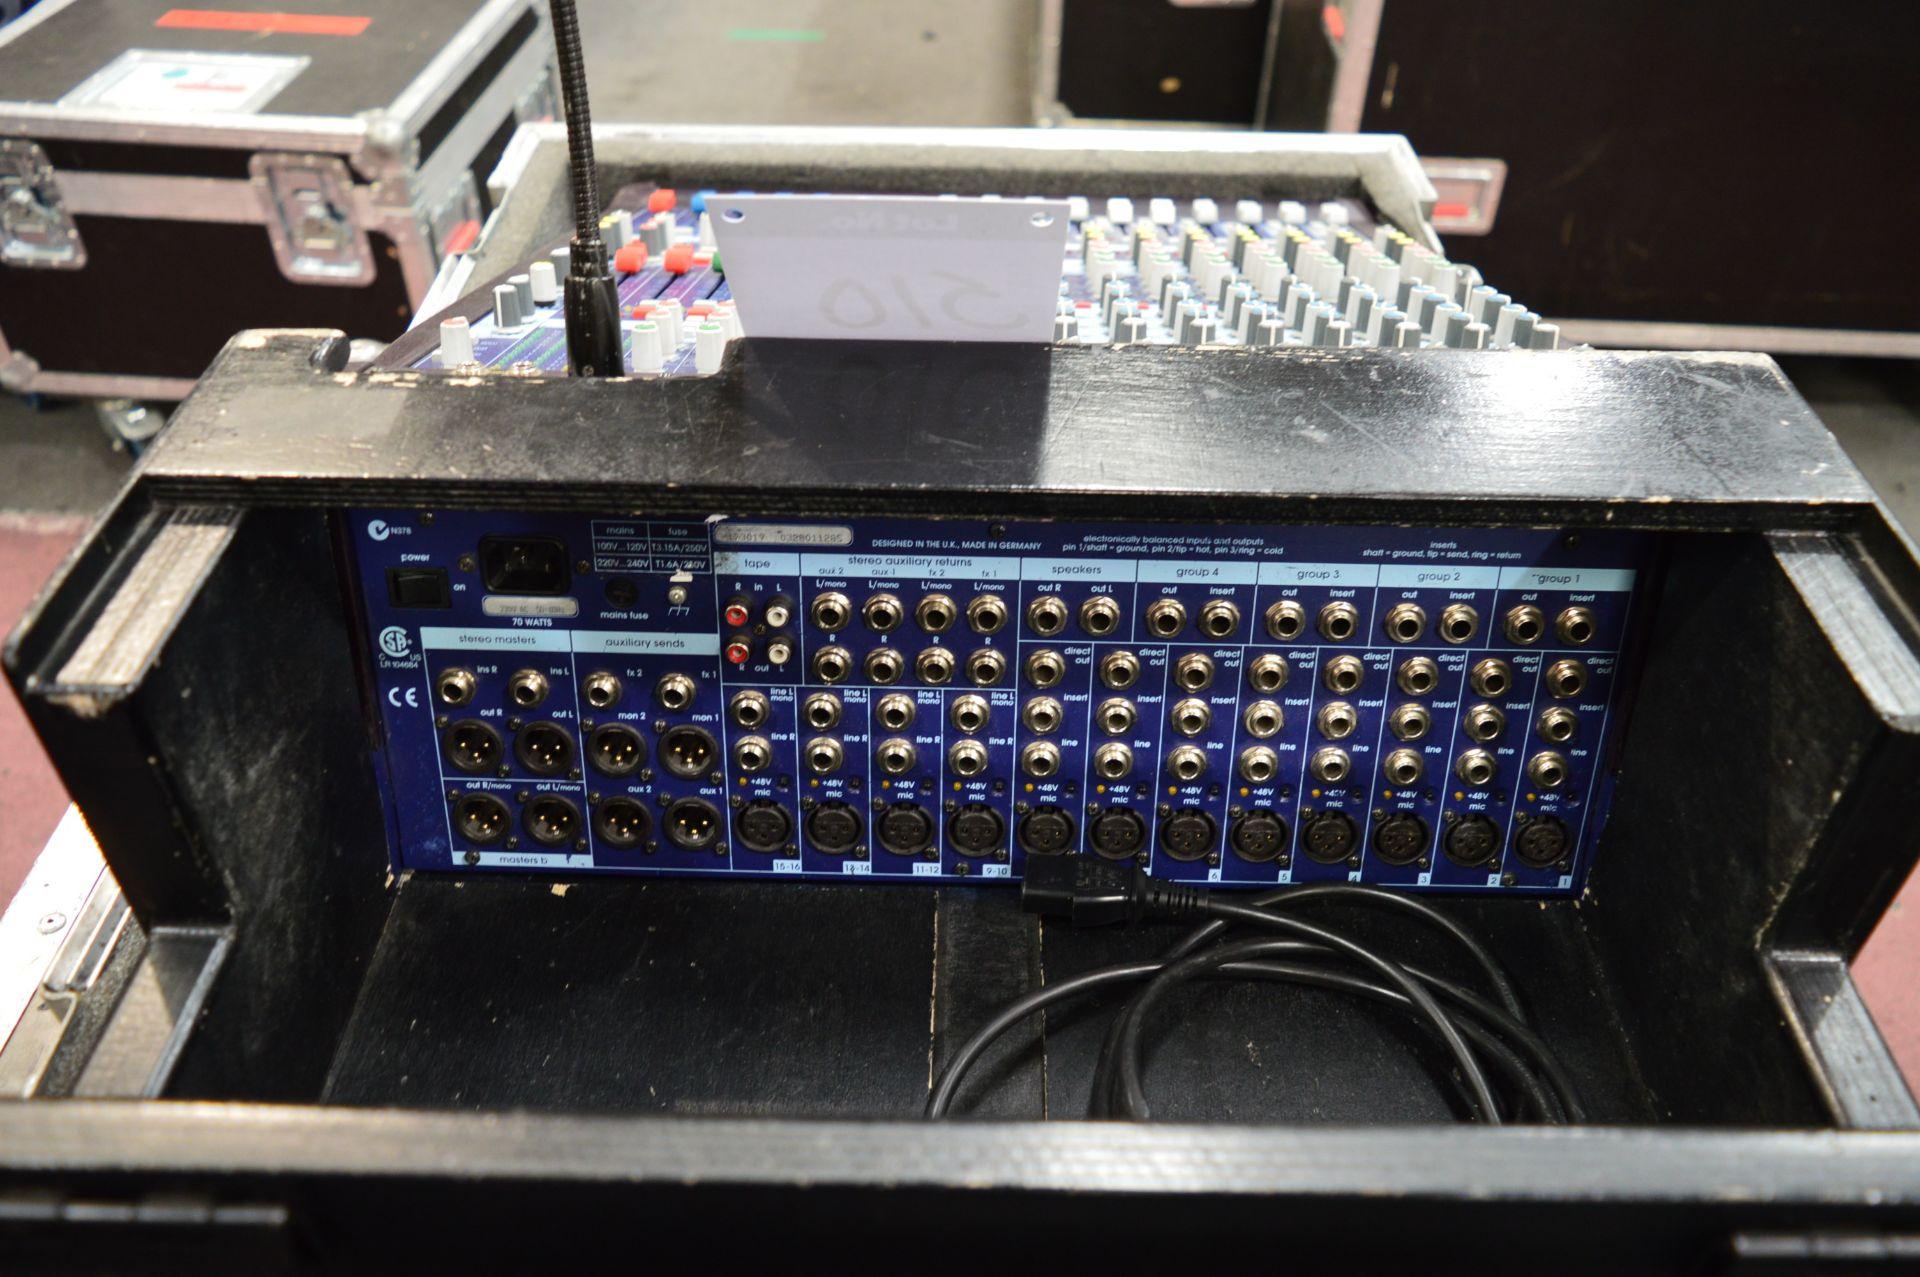 Lot 510 - Midas, Venice 160 16 channel analogue mixing conso